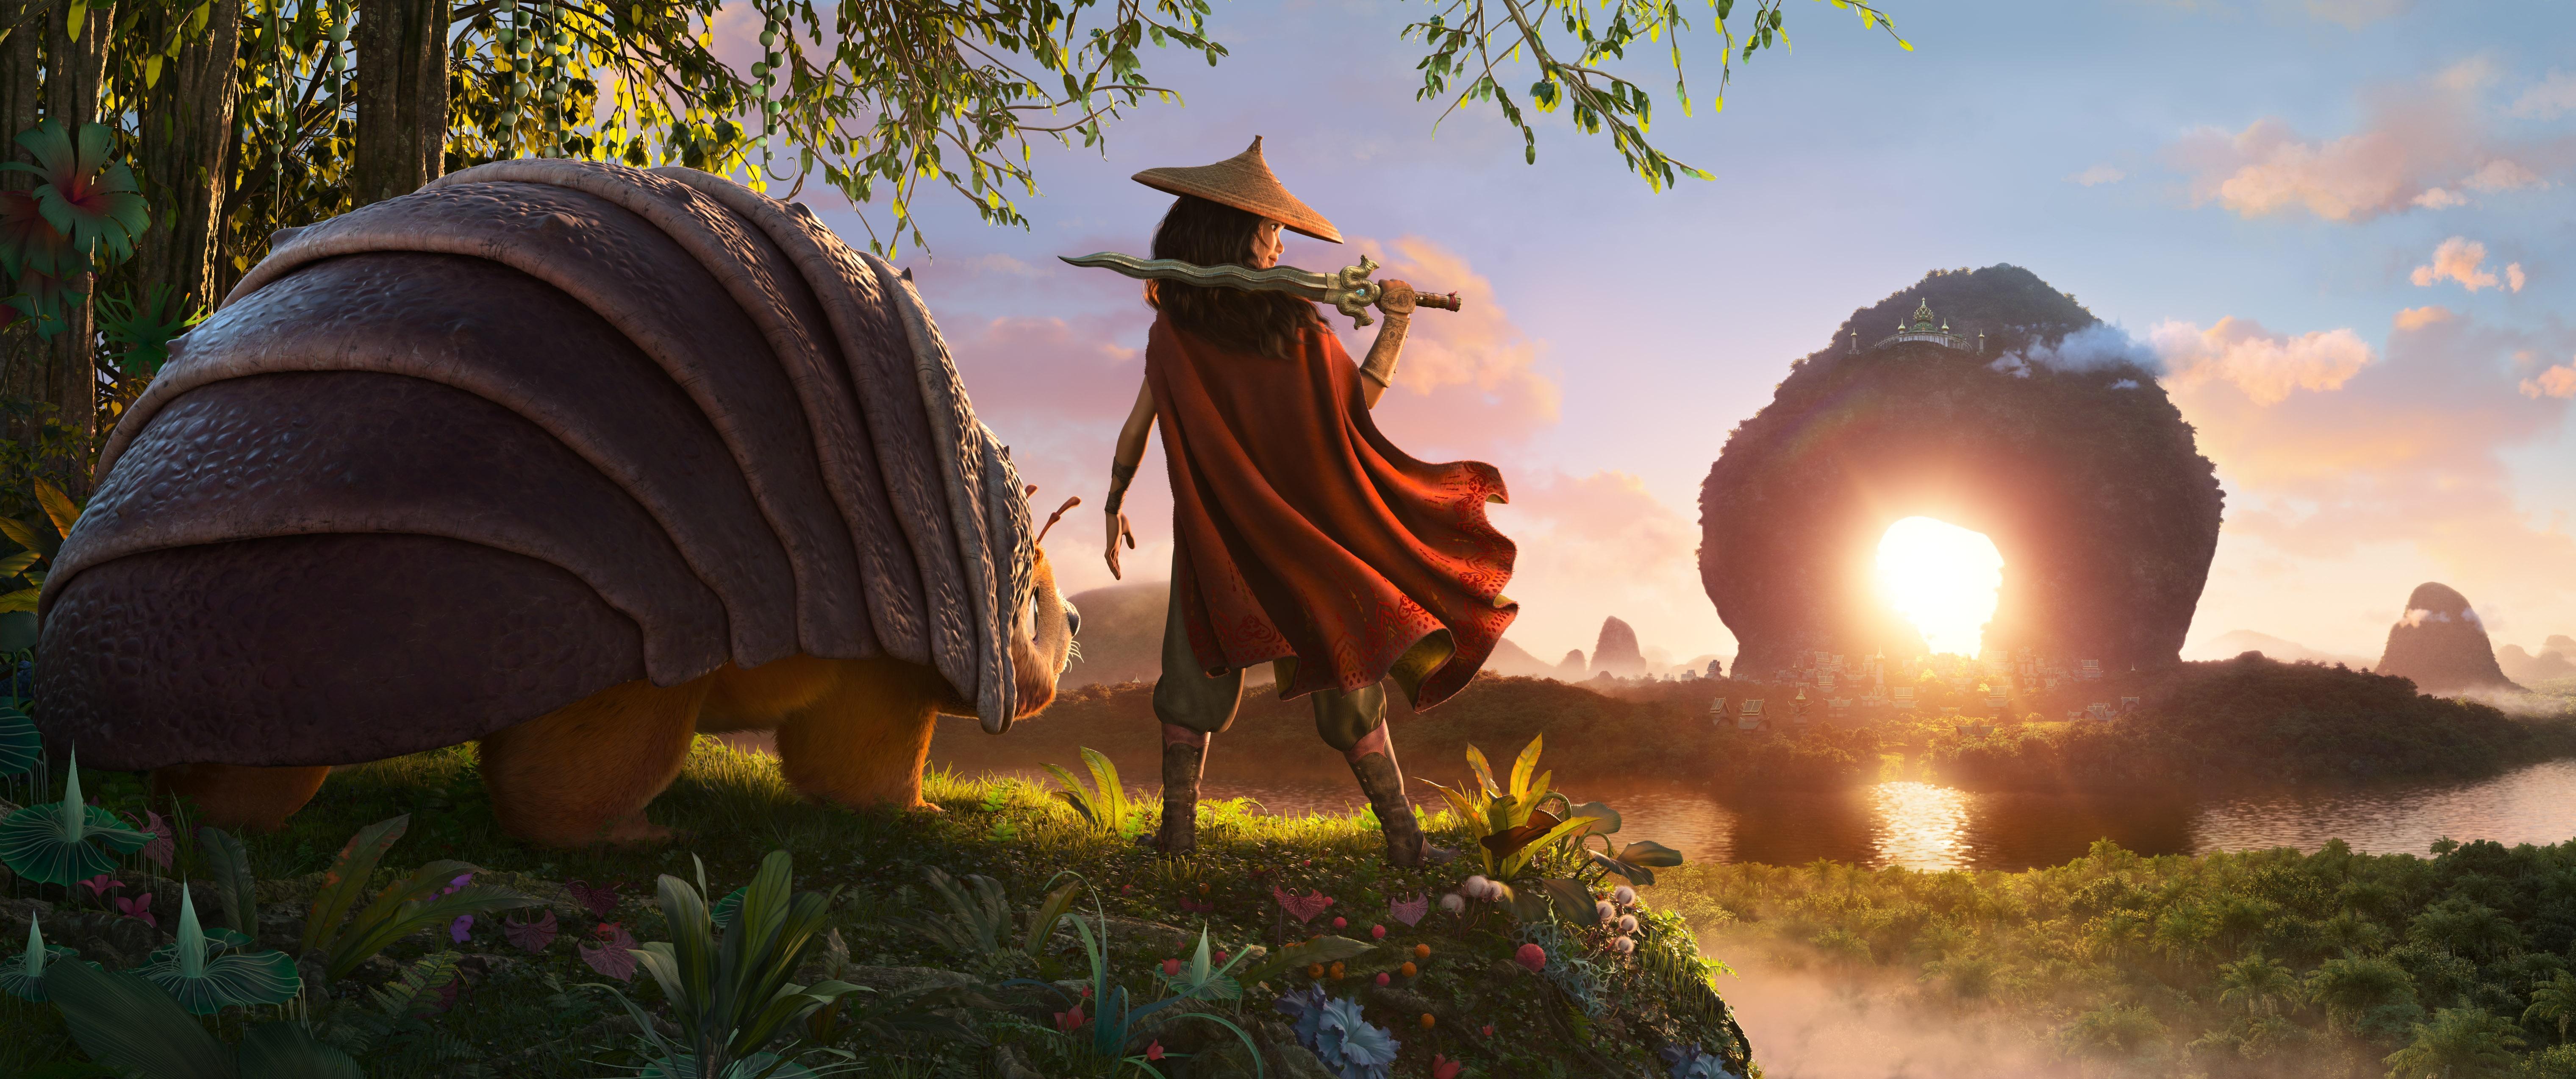 RAYA-AND-THE-LAST-DRAGON-As-an-evil-force-threatens-the-kingdom-of-Kumandra-it-is-up-to-warrior-Raya